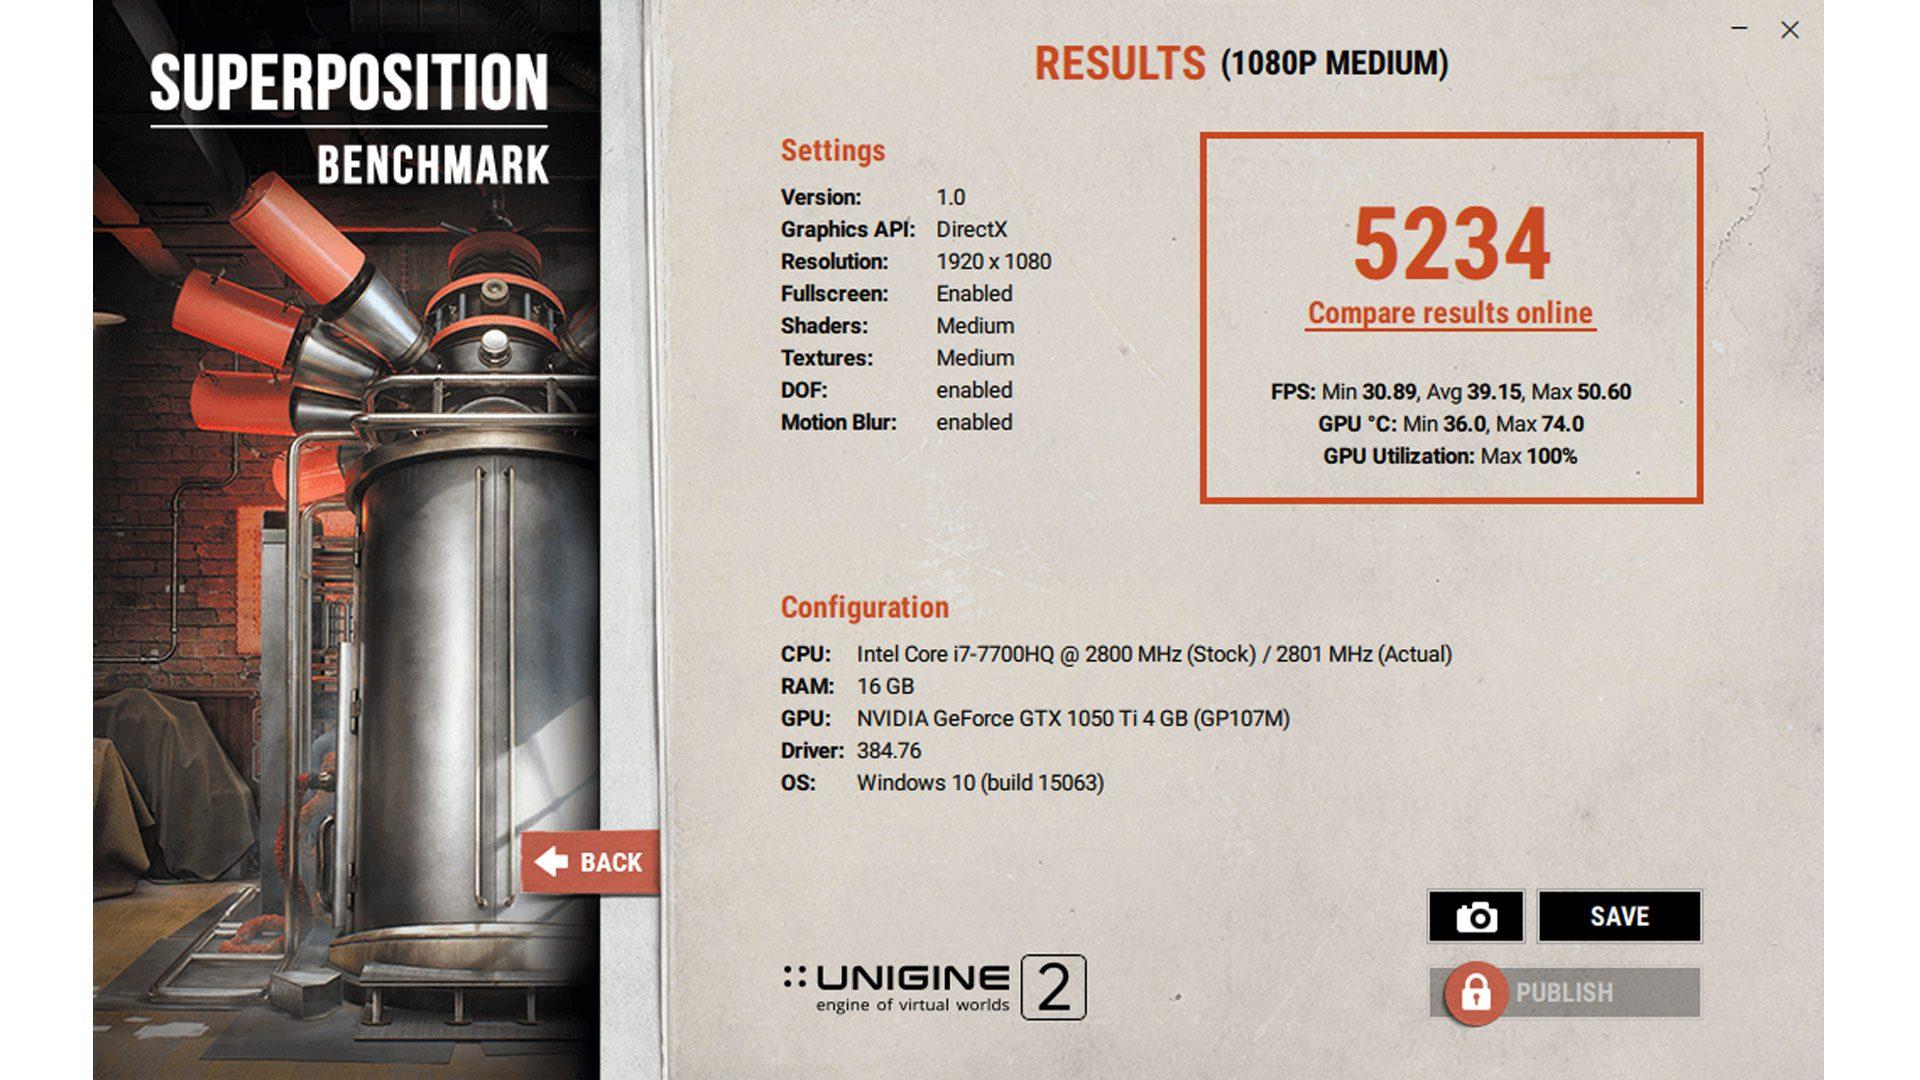 Schenker-XMGA507-NBB-qjz_Grafik-10